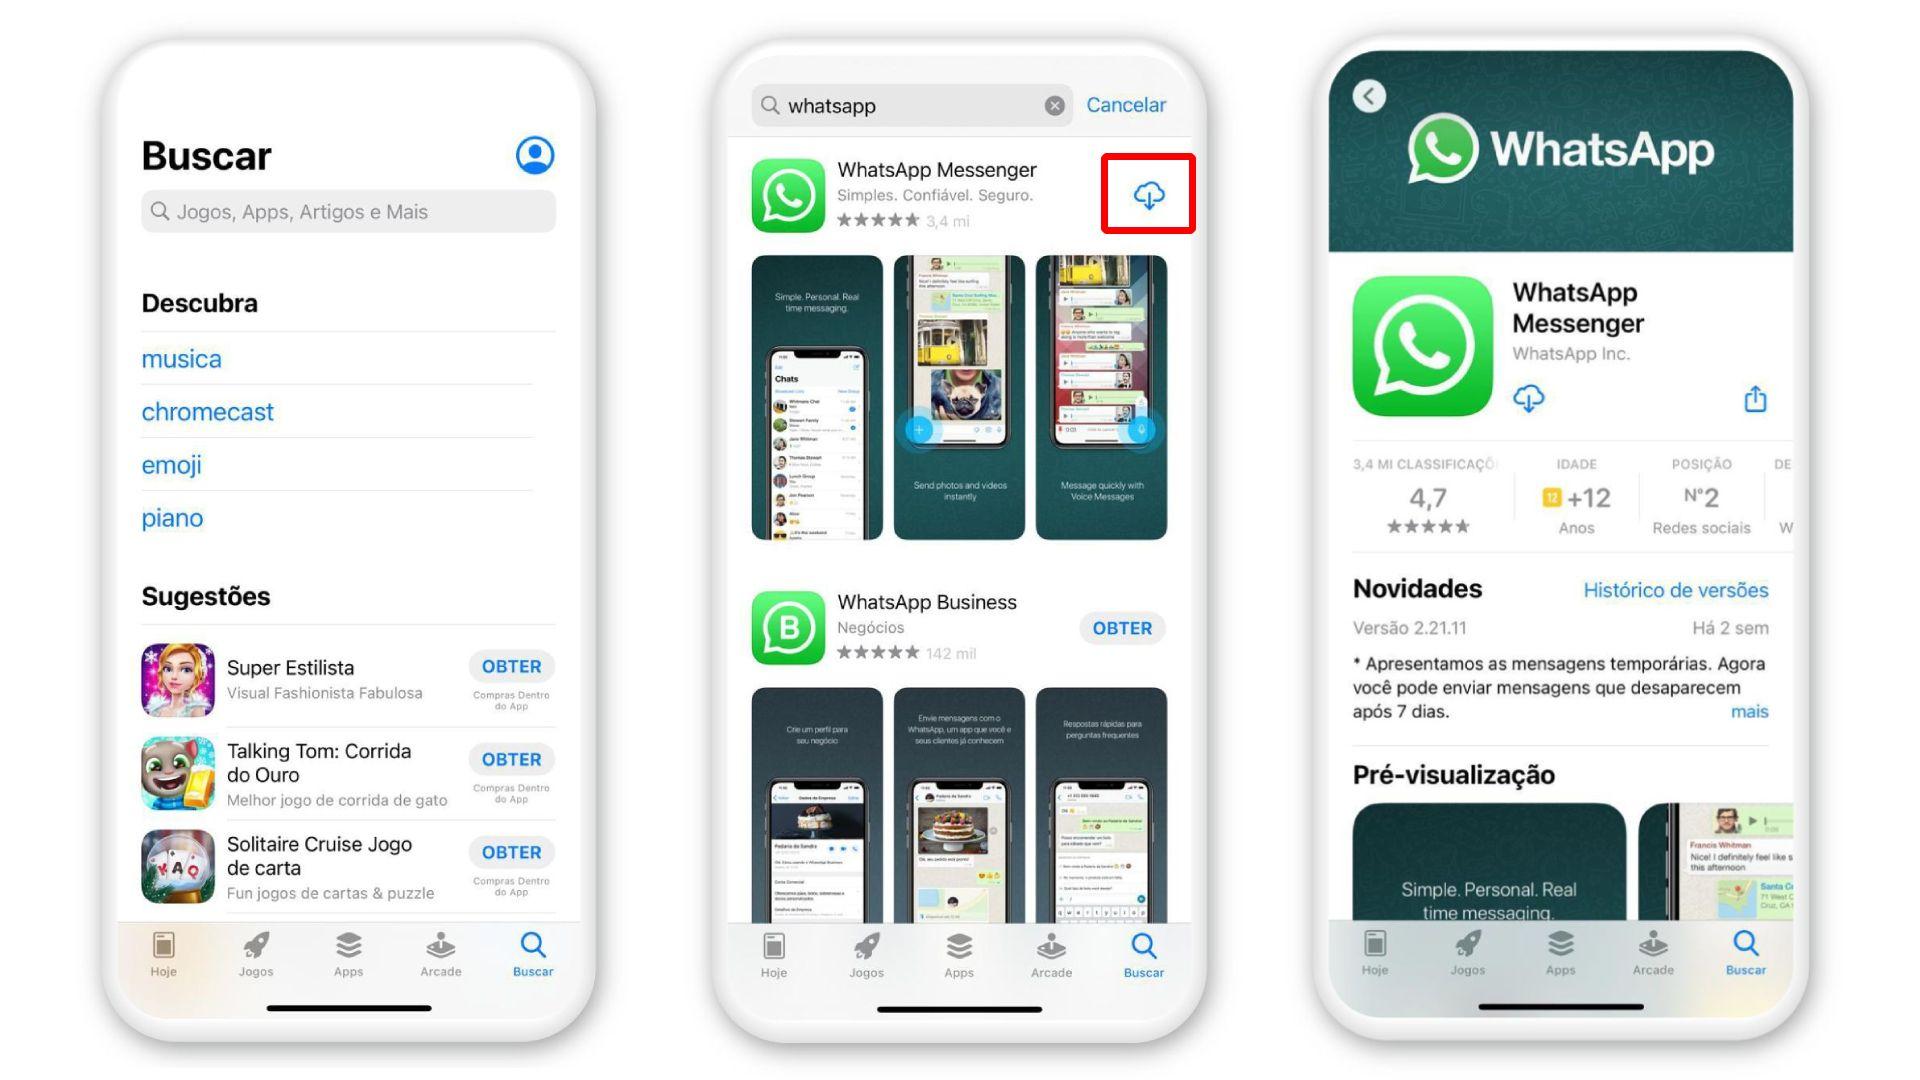 Como instalar o WhatsApp: faça download para iPhone na App Store (Foto: Arte/Zoom)